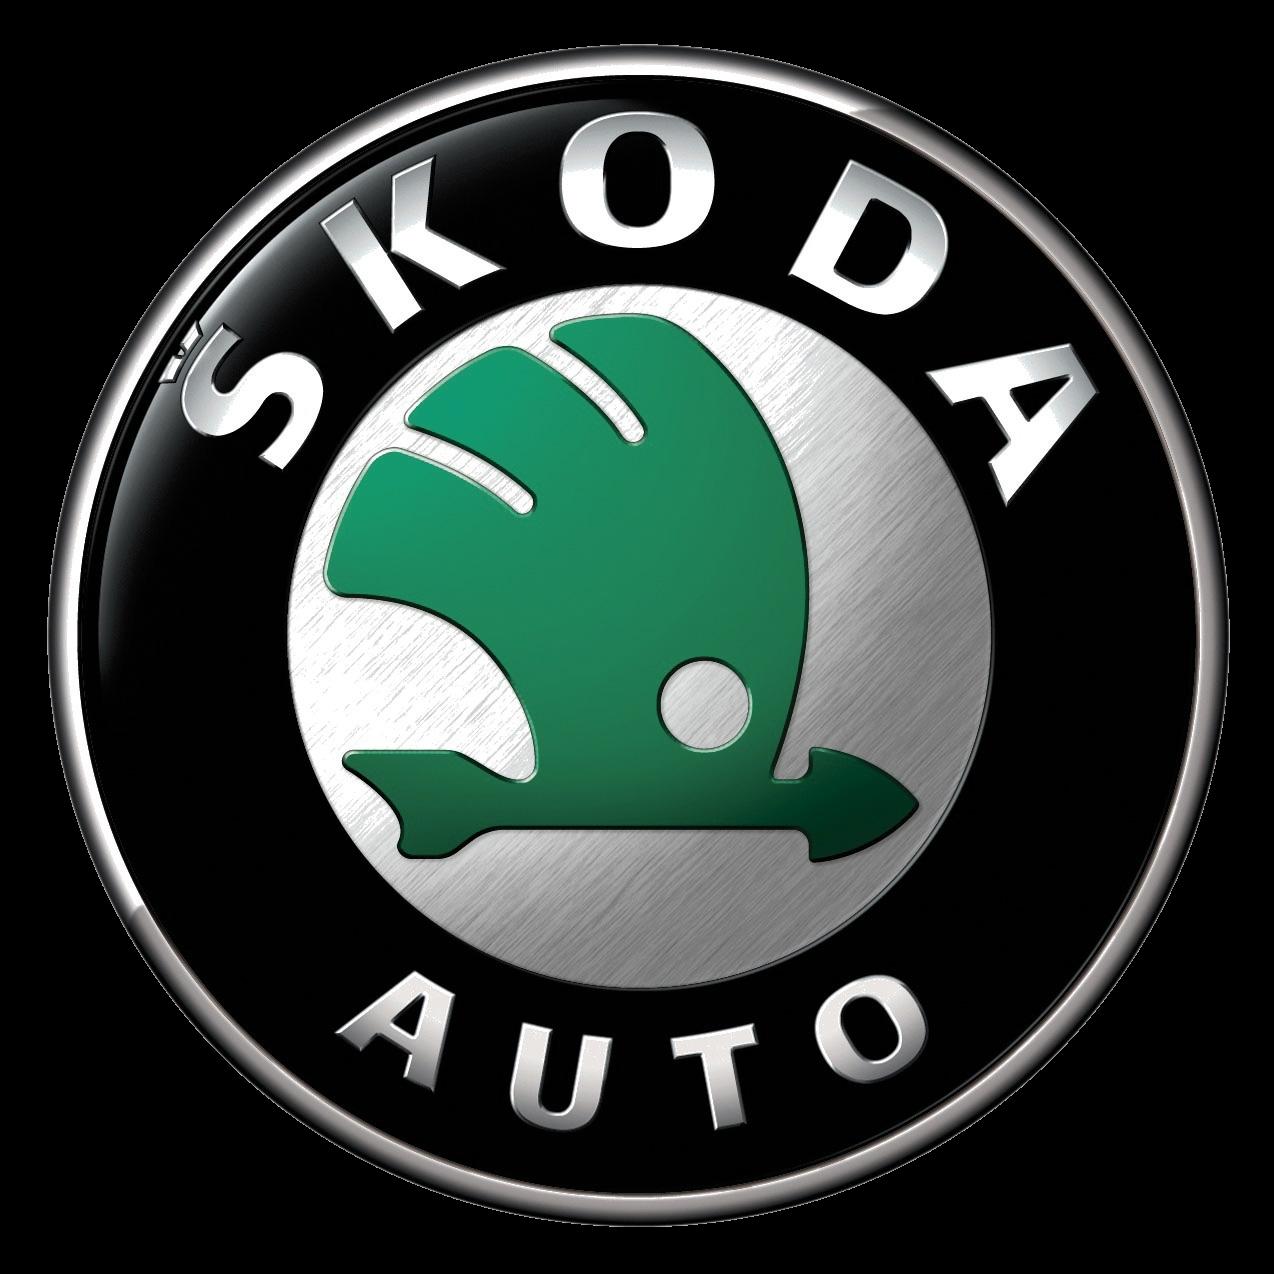 Skoda Auto Logo PNG Image.